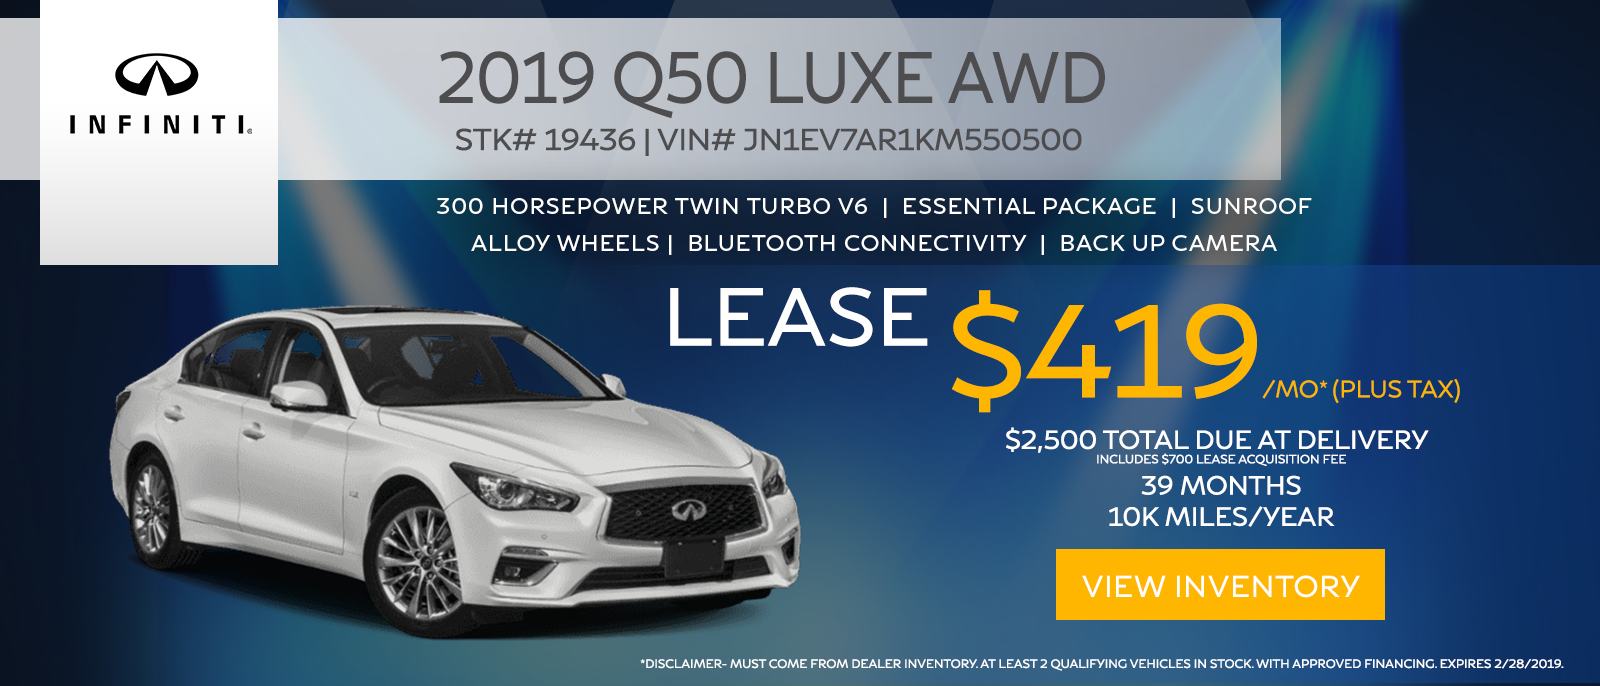 2019 Q50 Lease